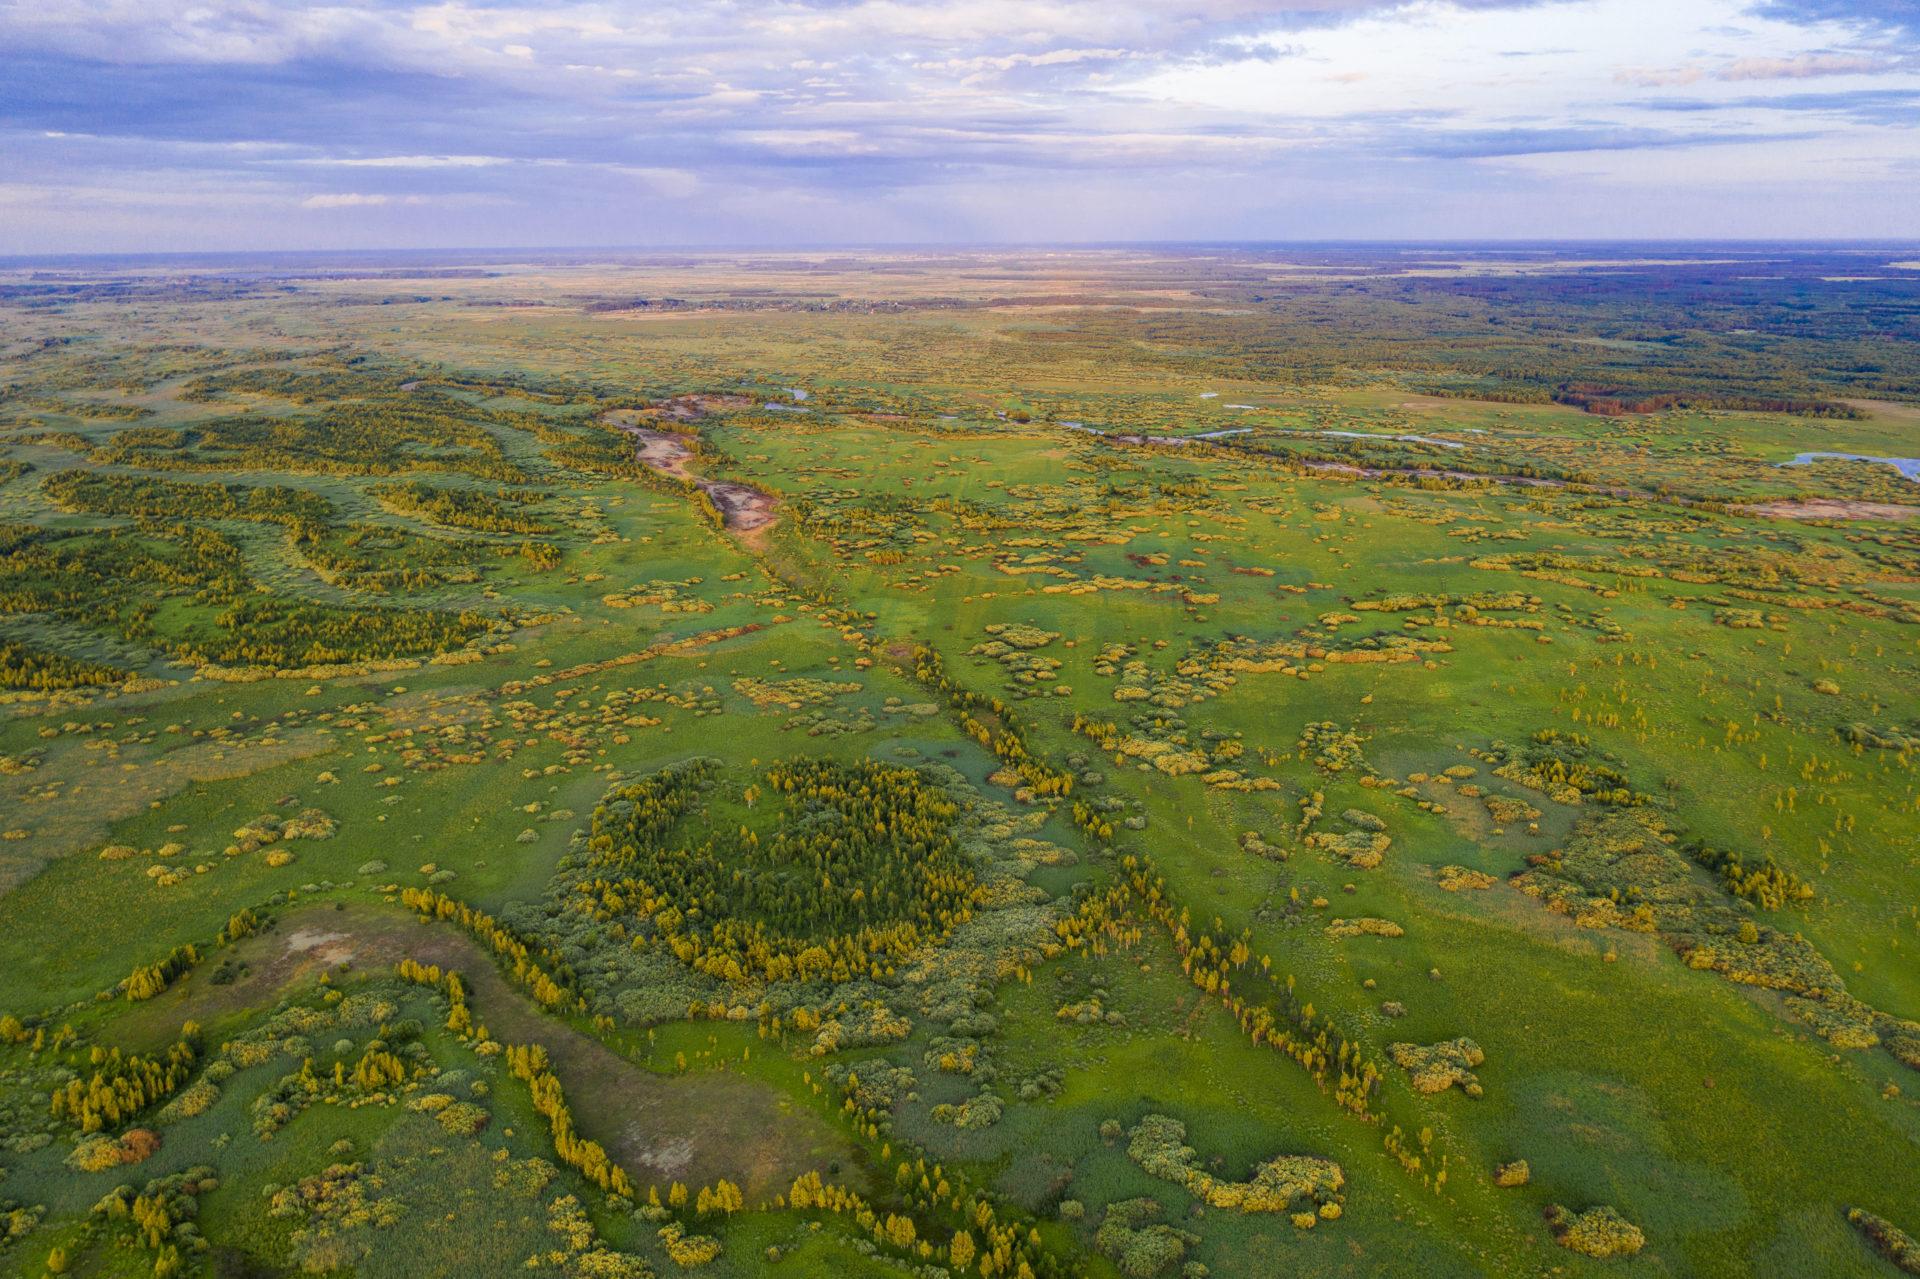 Prypiat-Stokhid National Park in Ukrainian Polesia